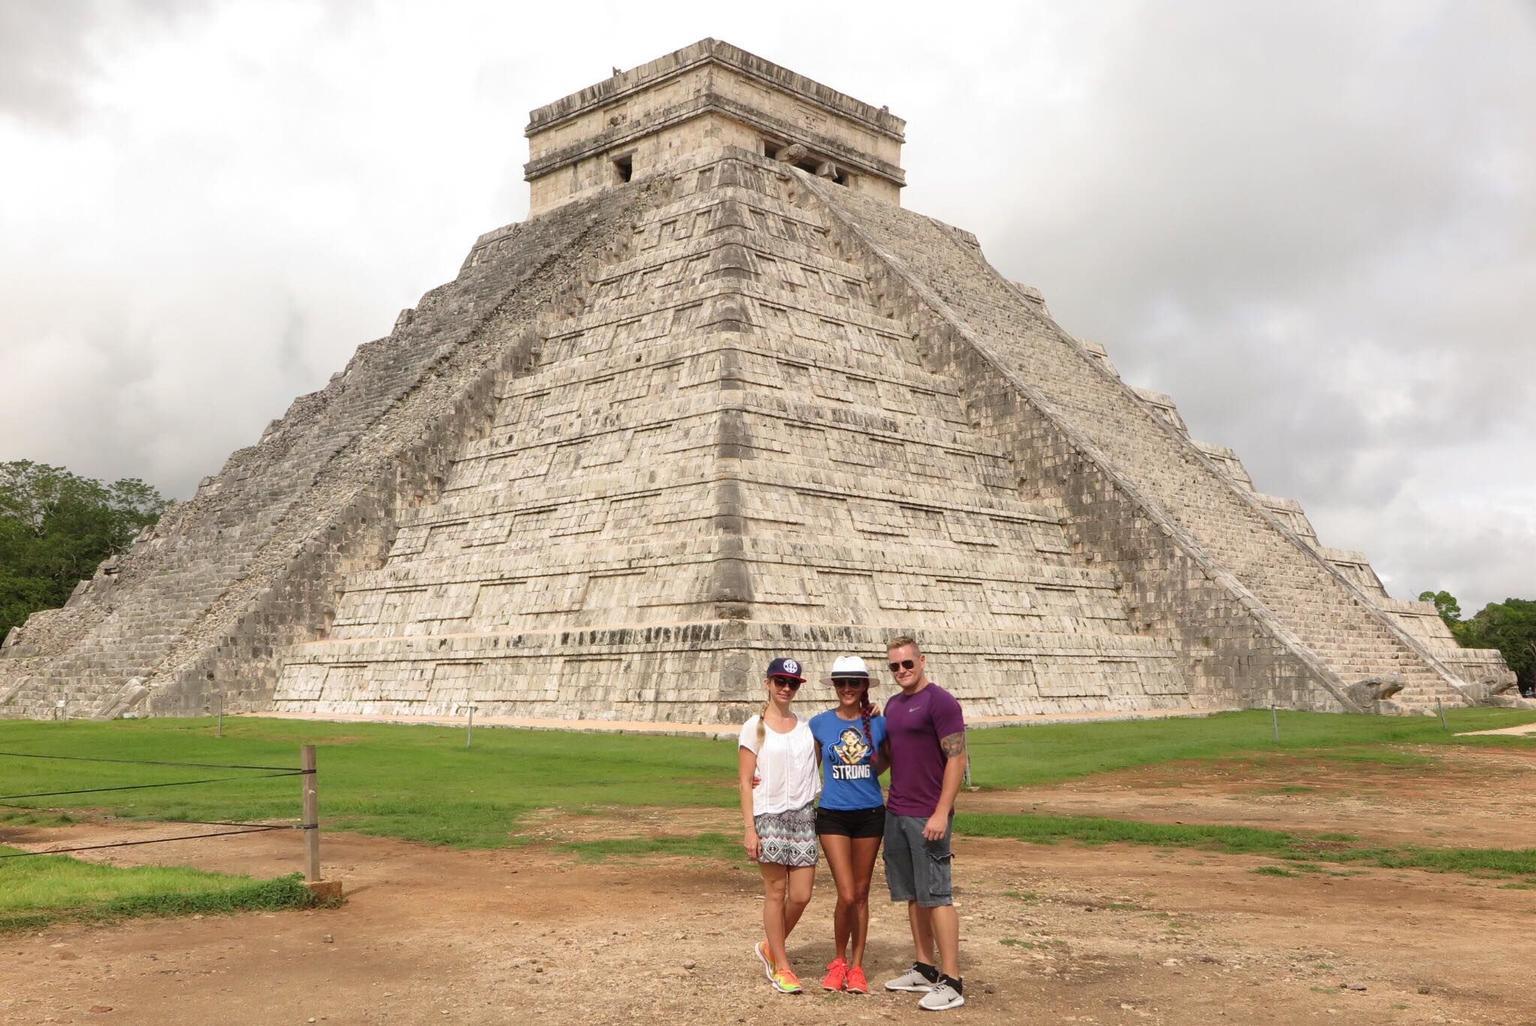 MAIS FOTOS, Chichén Itzá, Cenote Ik Kil e Coba saindo de Playa del Carmen